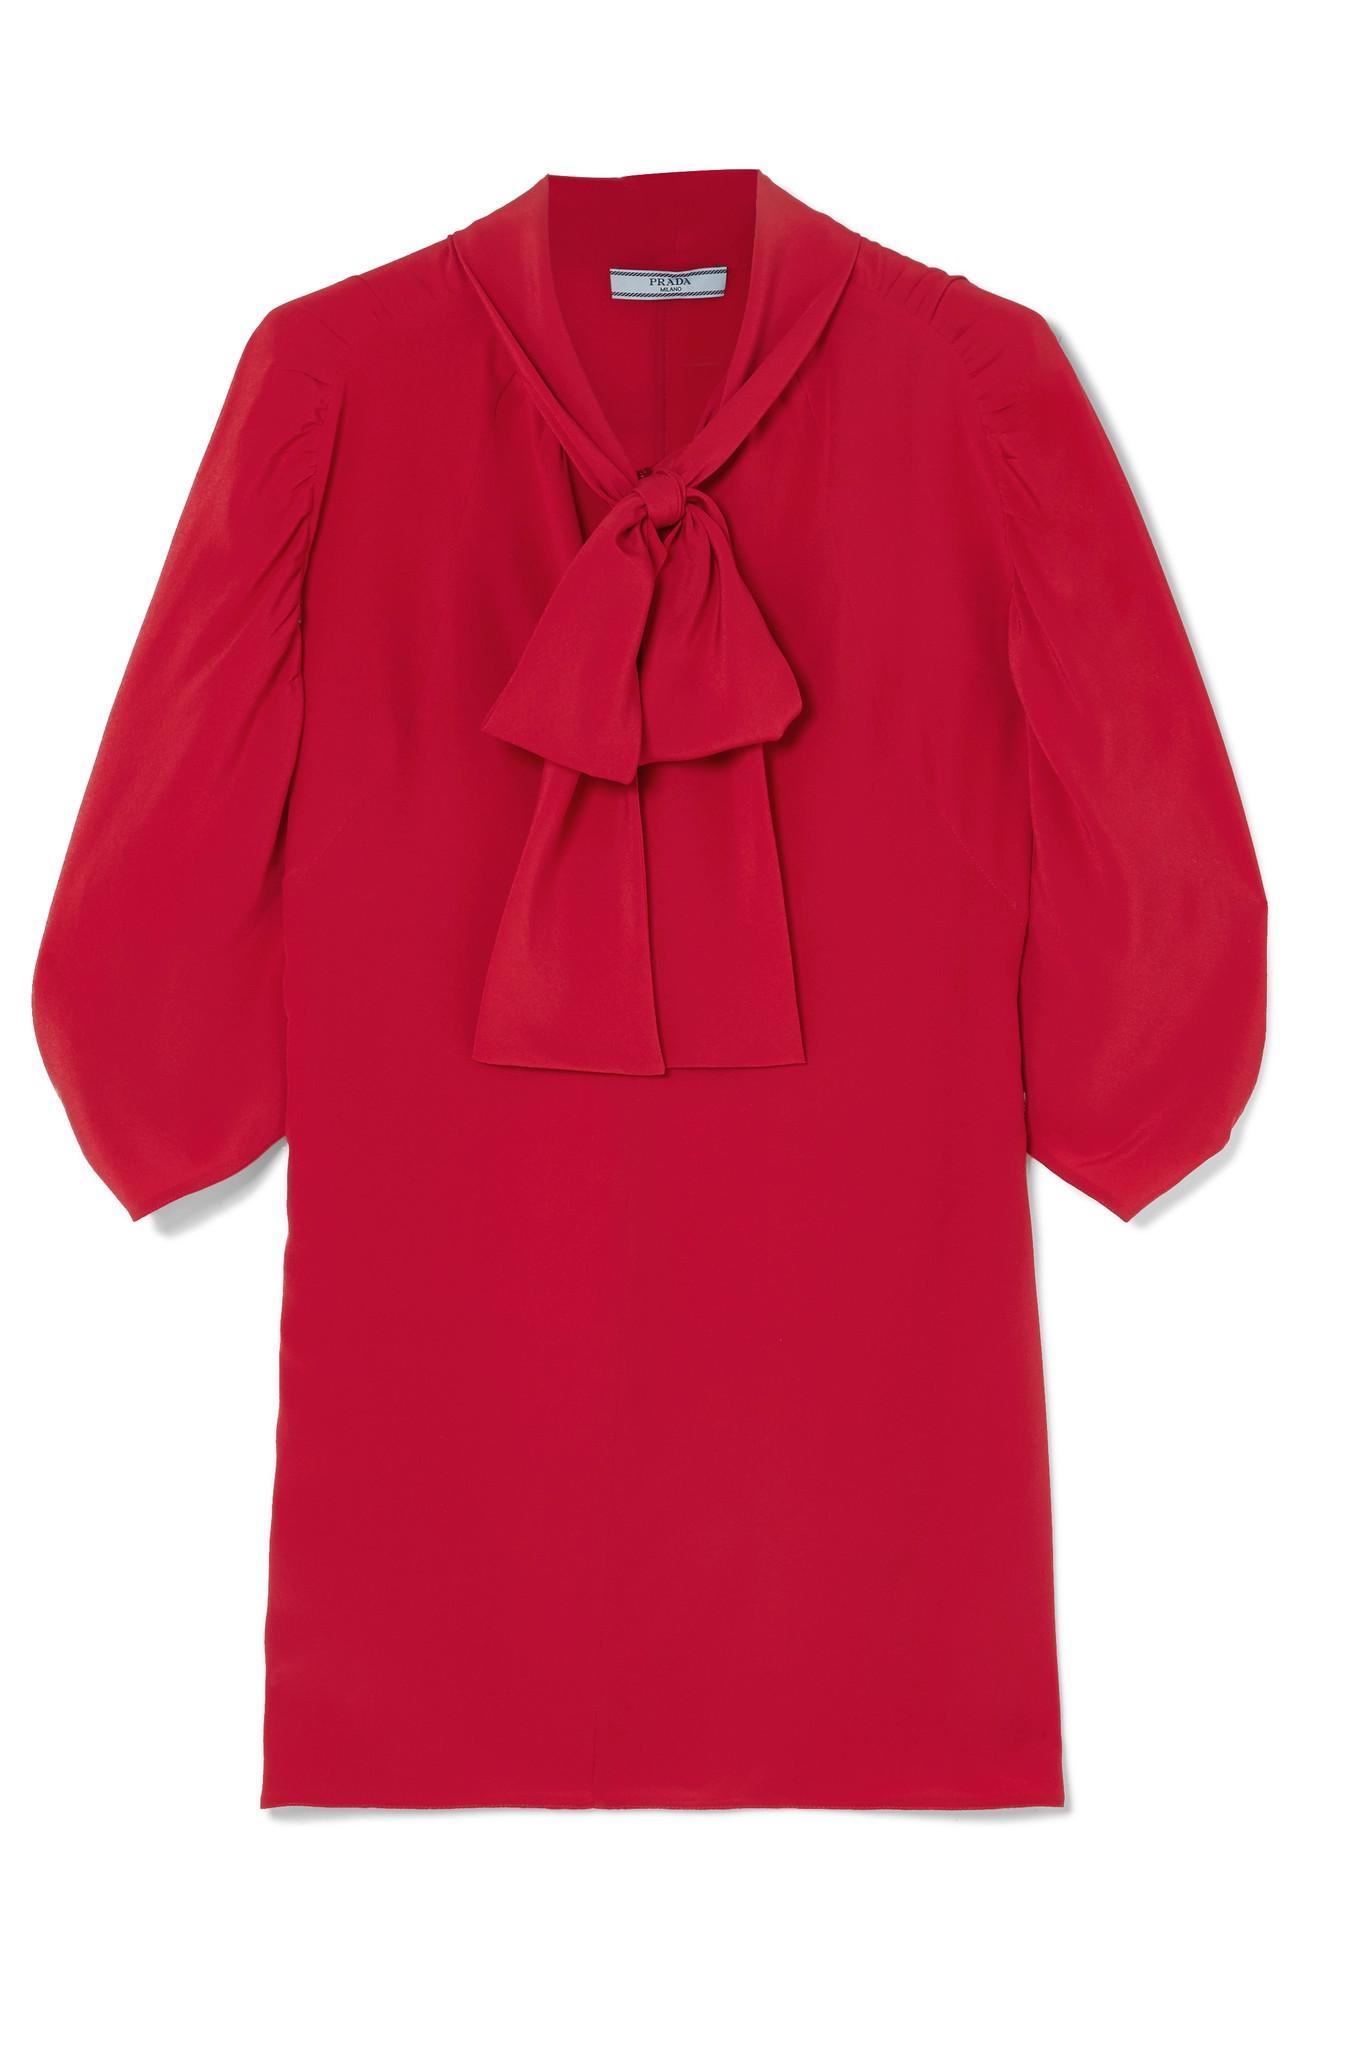 e9b34e89dc6941 Prada - Red Pussy-bow Silk Crepe De Chine Blouse - Lyst. View fullscreen